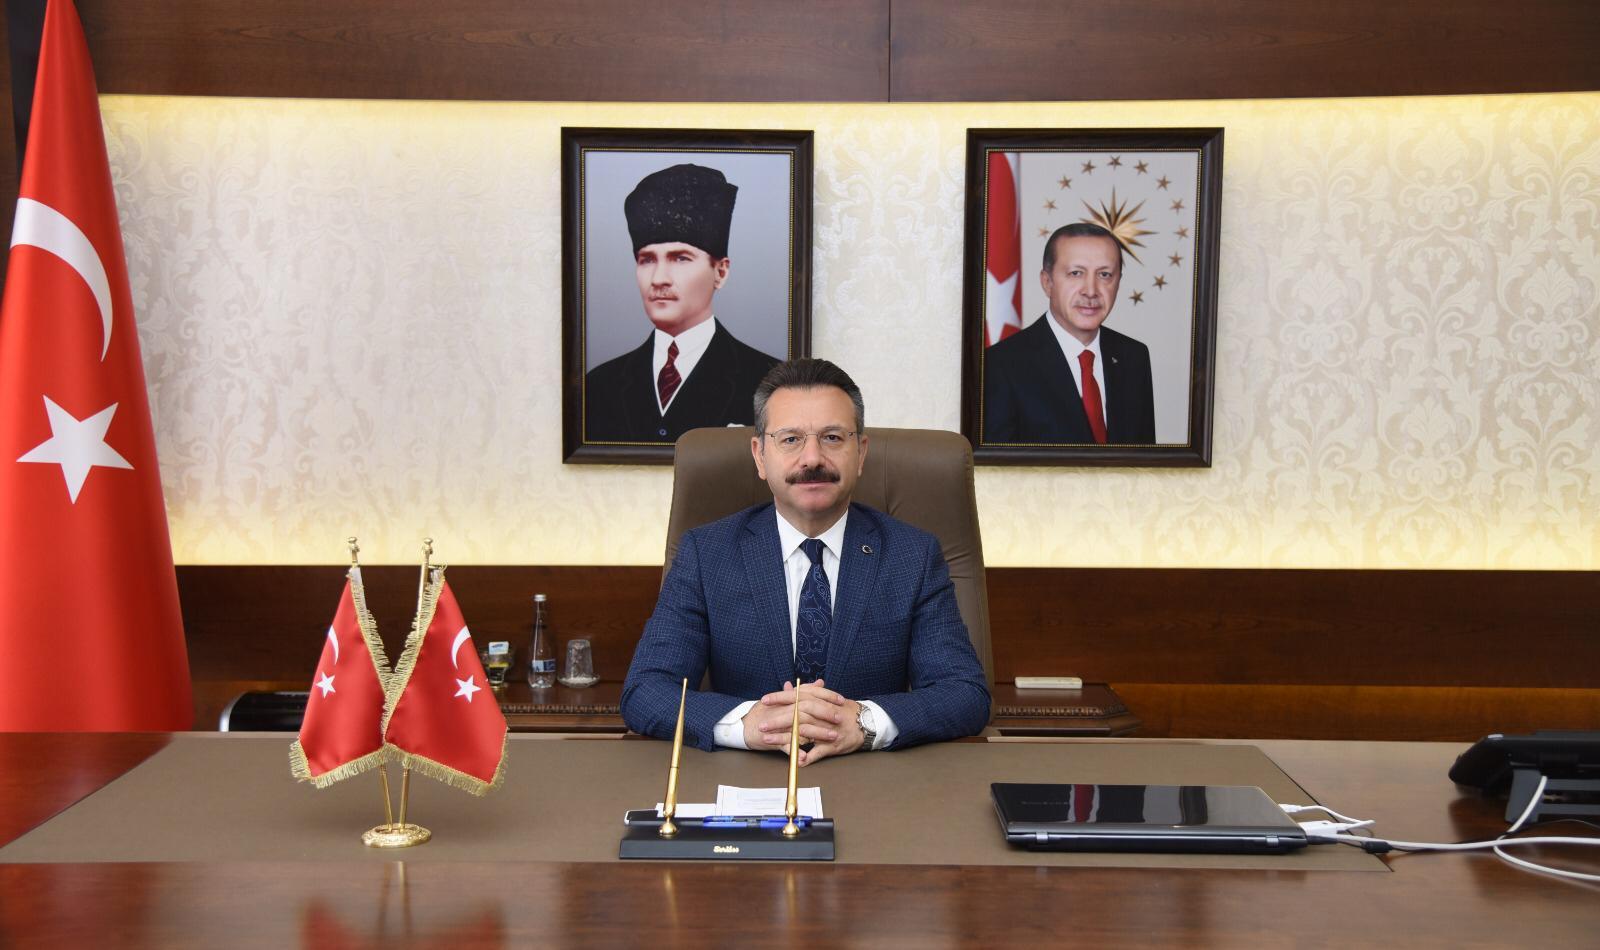 Valimiz Sayın Hüseyin Aksoy'un 30 Ağustos Zafer Bayramı Mesajı